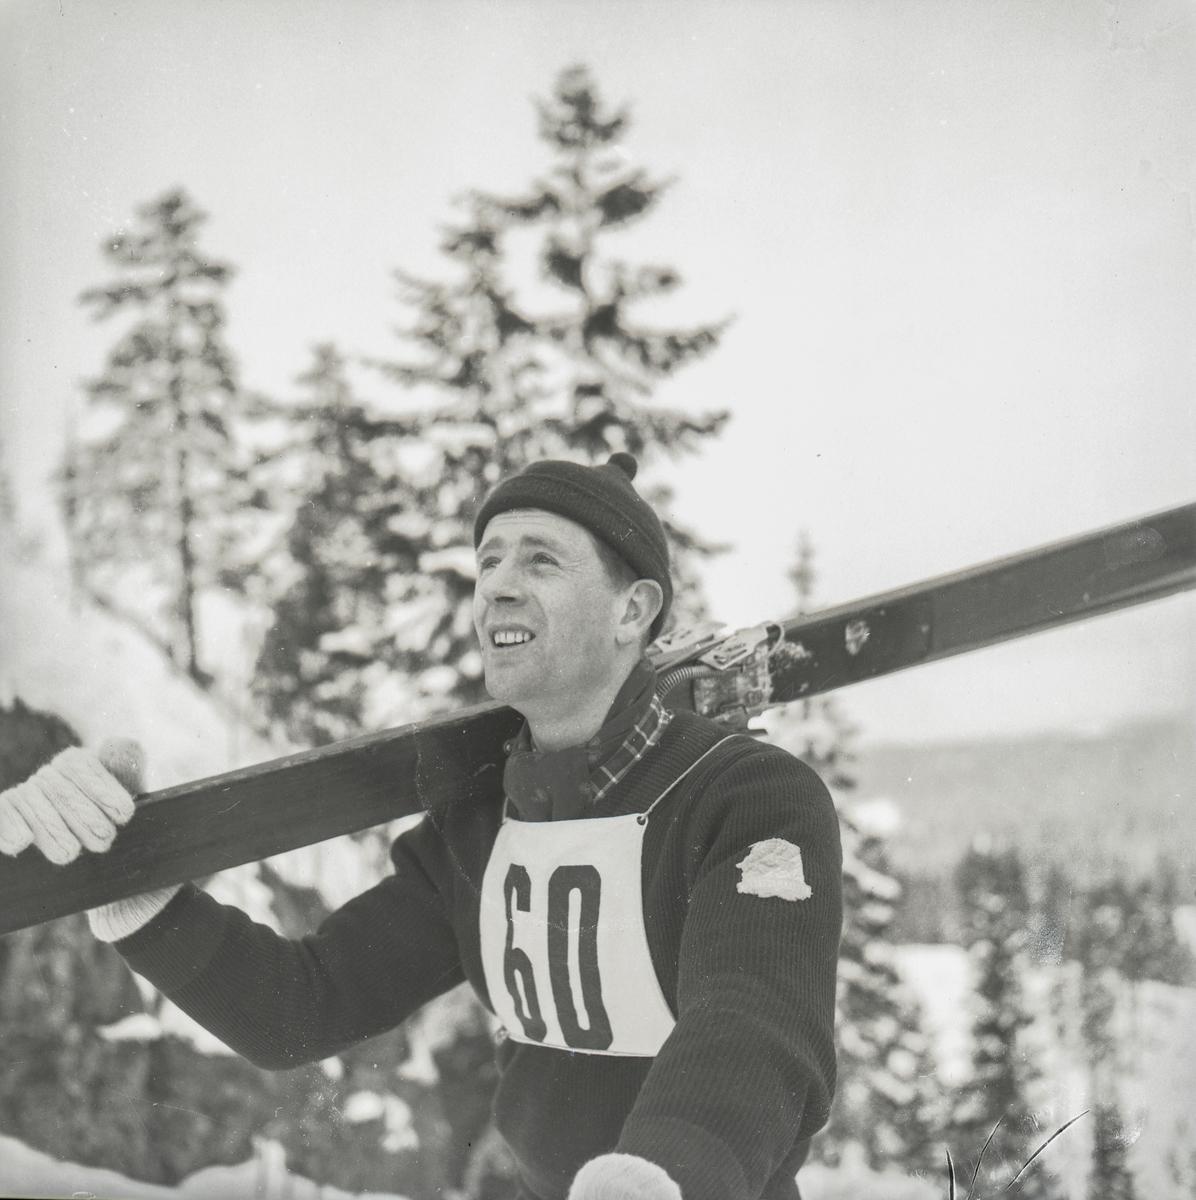 A Kongsberg skier